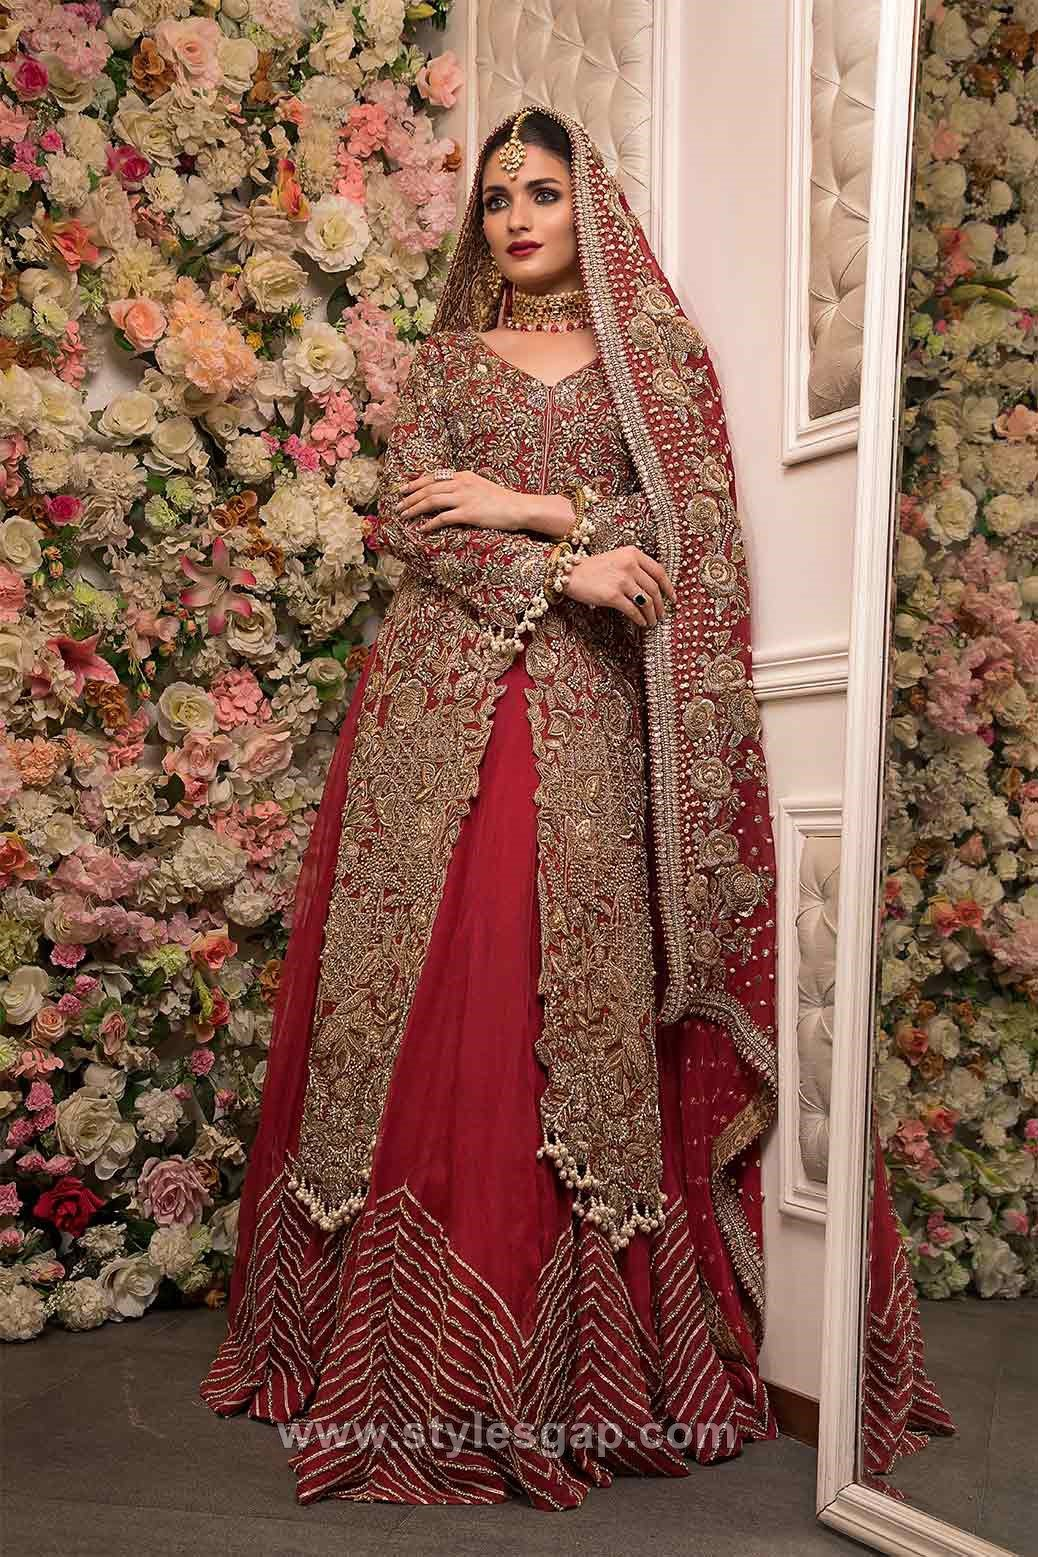 Pakistani Bridal Dress Brands & Designs